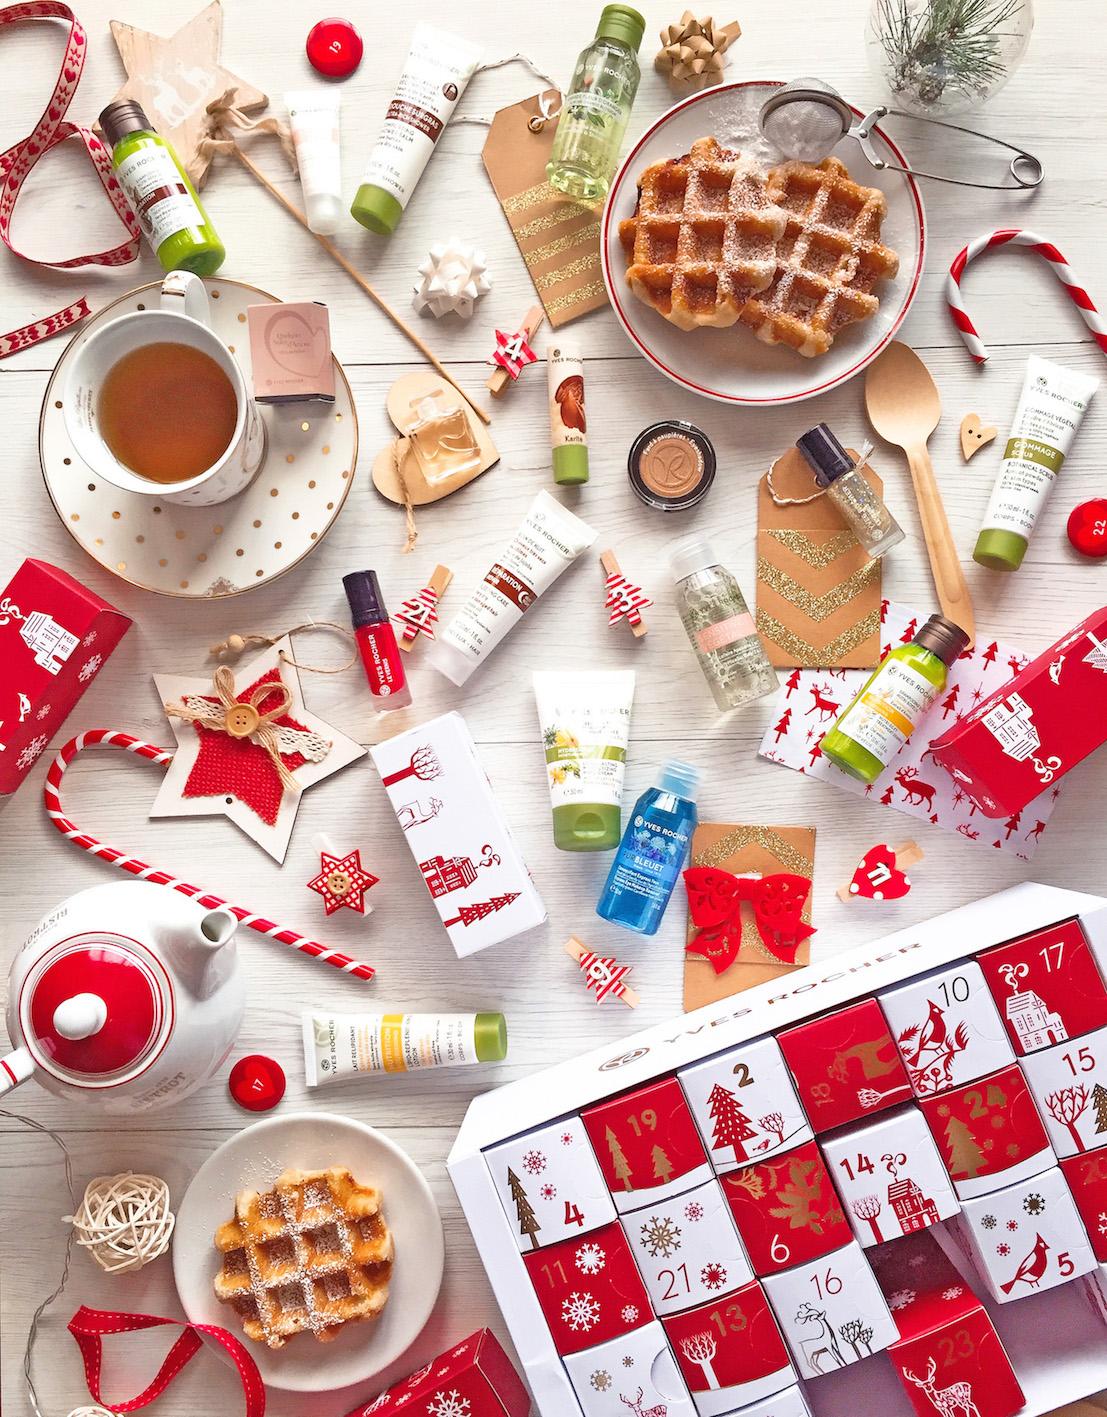 Calendario Avvento Yves Rocher.Aspettando Natale Il Calendario Dell Avvento Di Yves Rocher